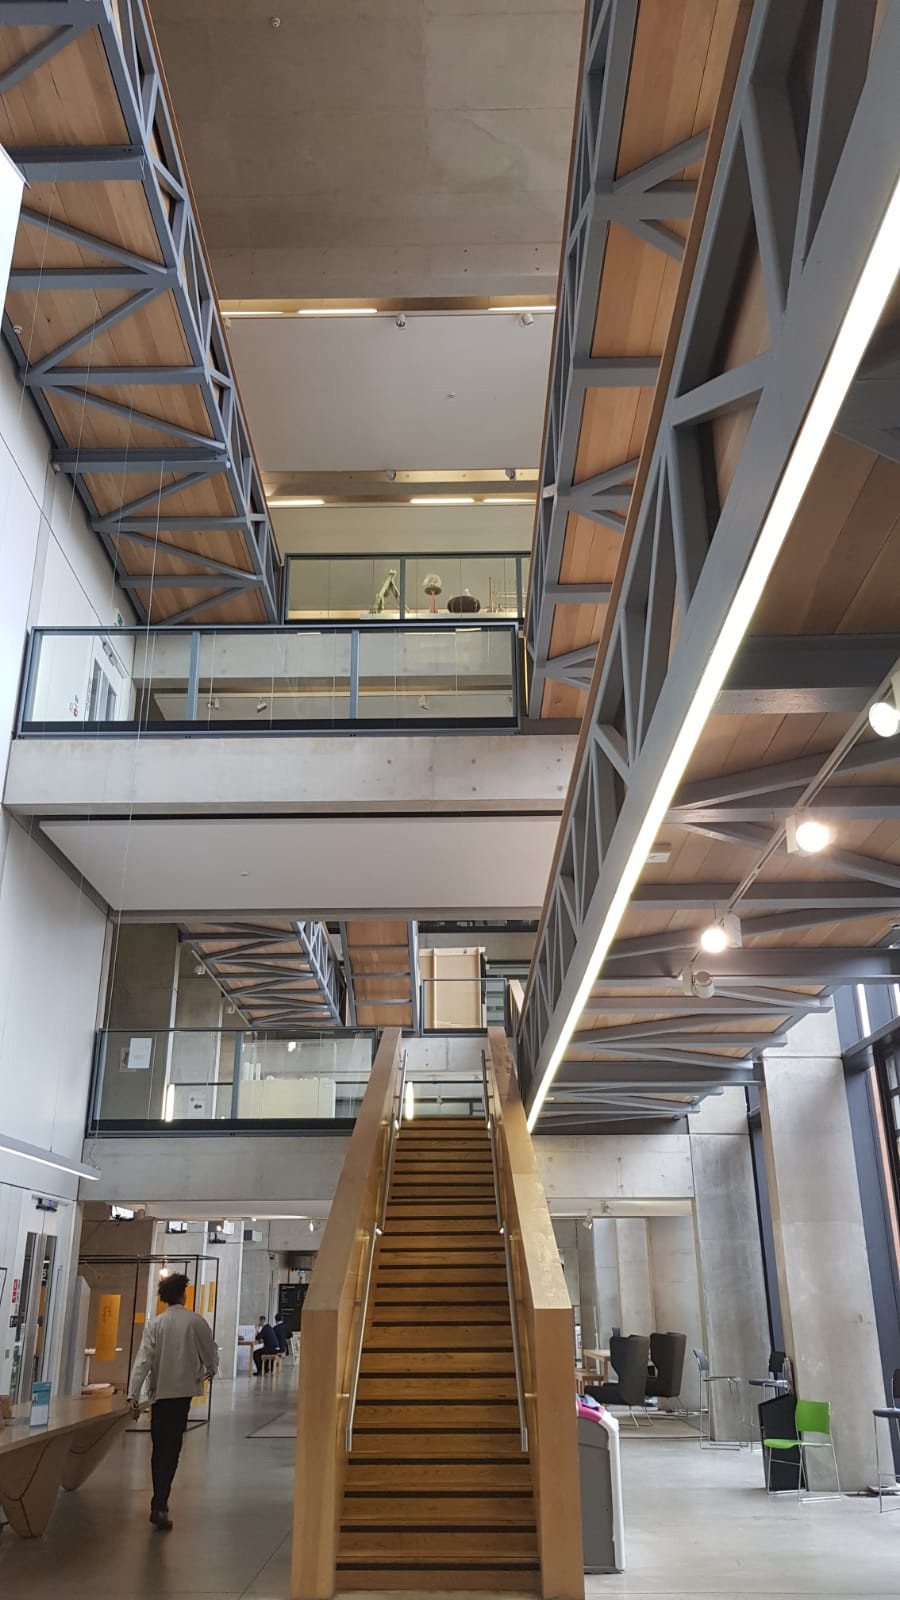 Manchester Metropolian University